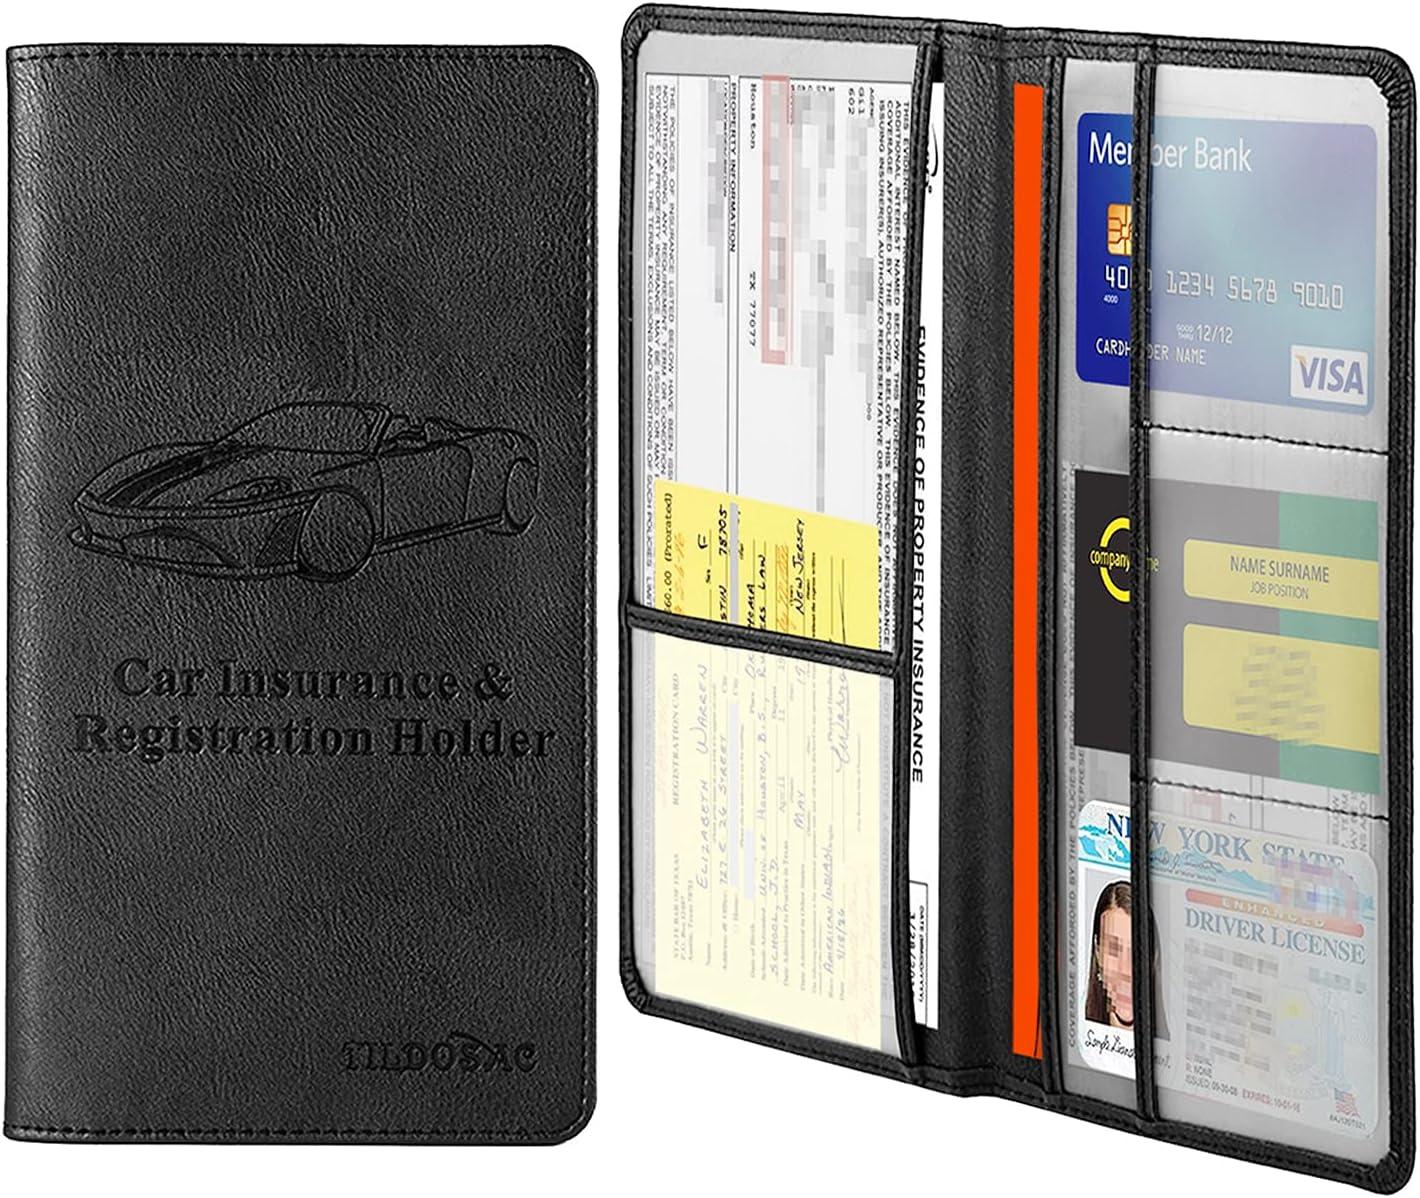 Car Registration and Insurance Card Holder,Tildosac Premium PU Leather  Vehicle Glove Box Paperwork Wallet Case Document Organizer for Driver's  License ...